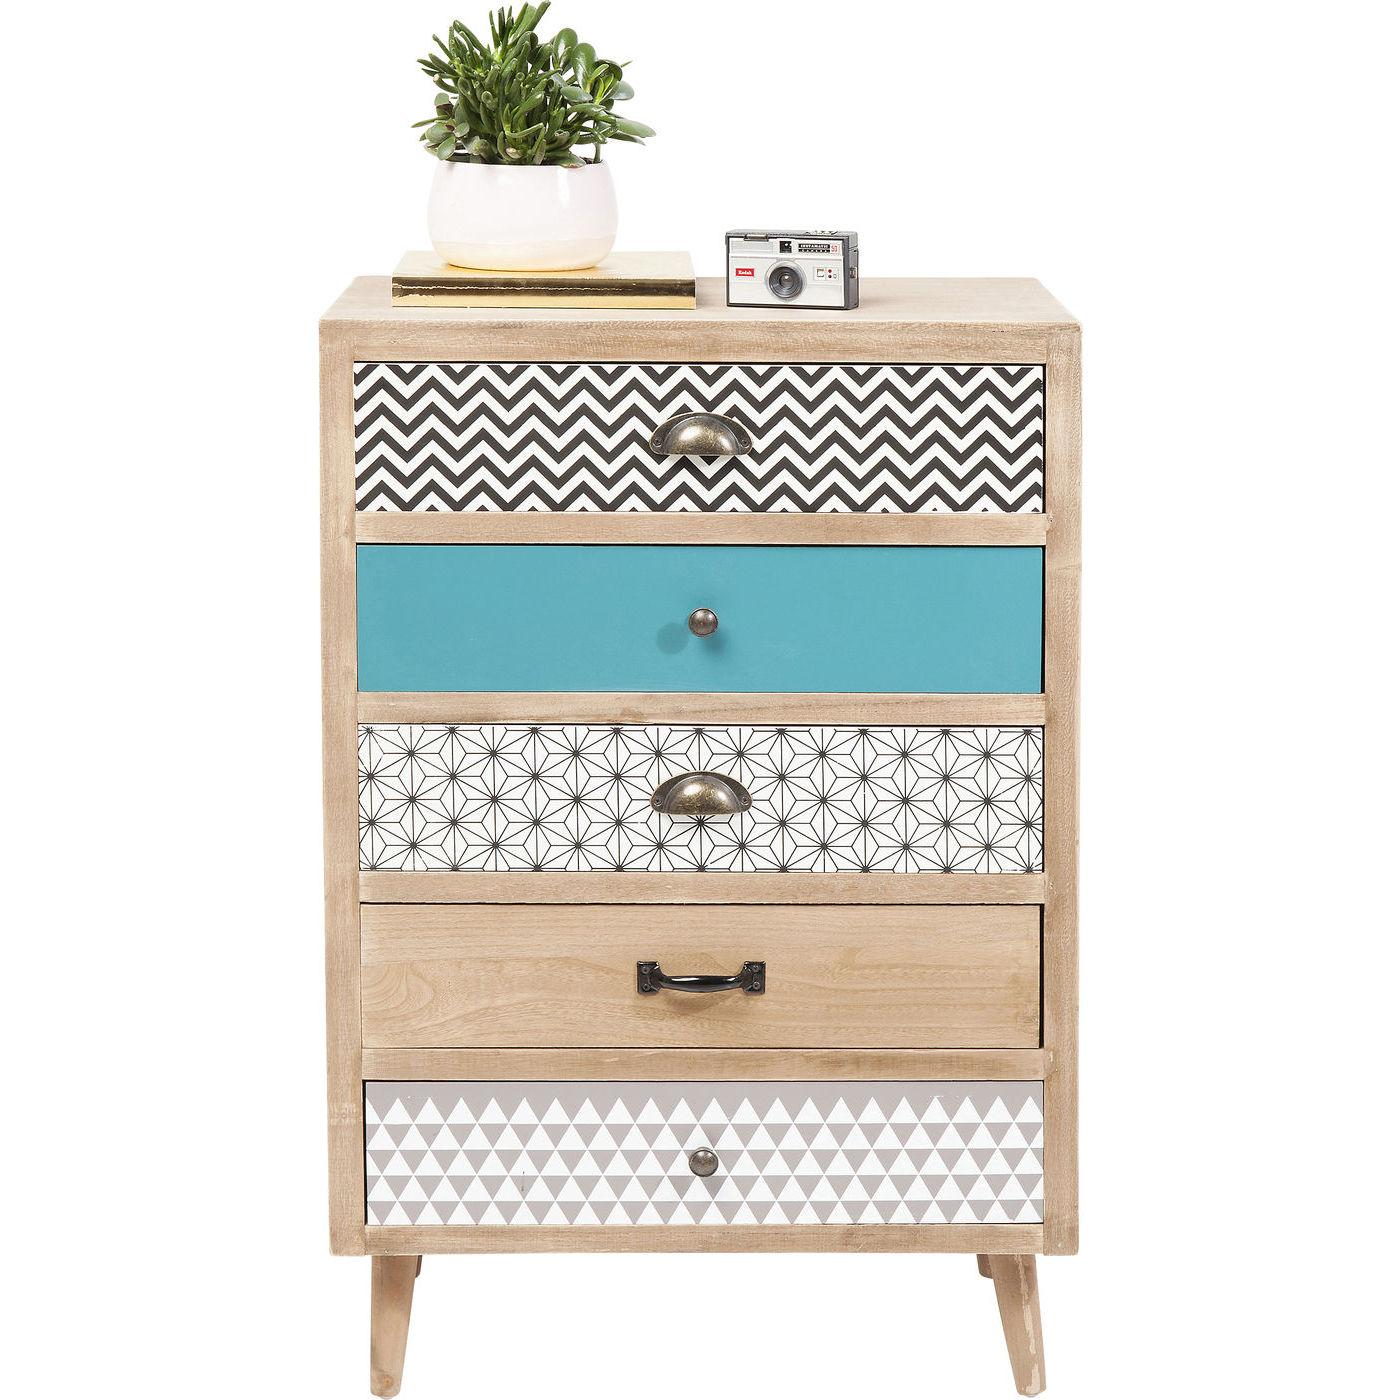 kare design capri kommode natur tr multifarvet papir m. Black Bedroom Furniture Sets. Home Design Ideas